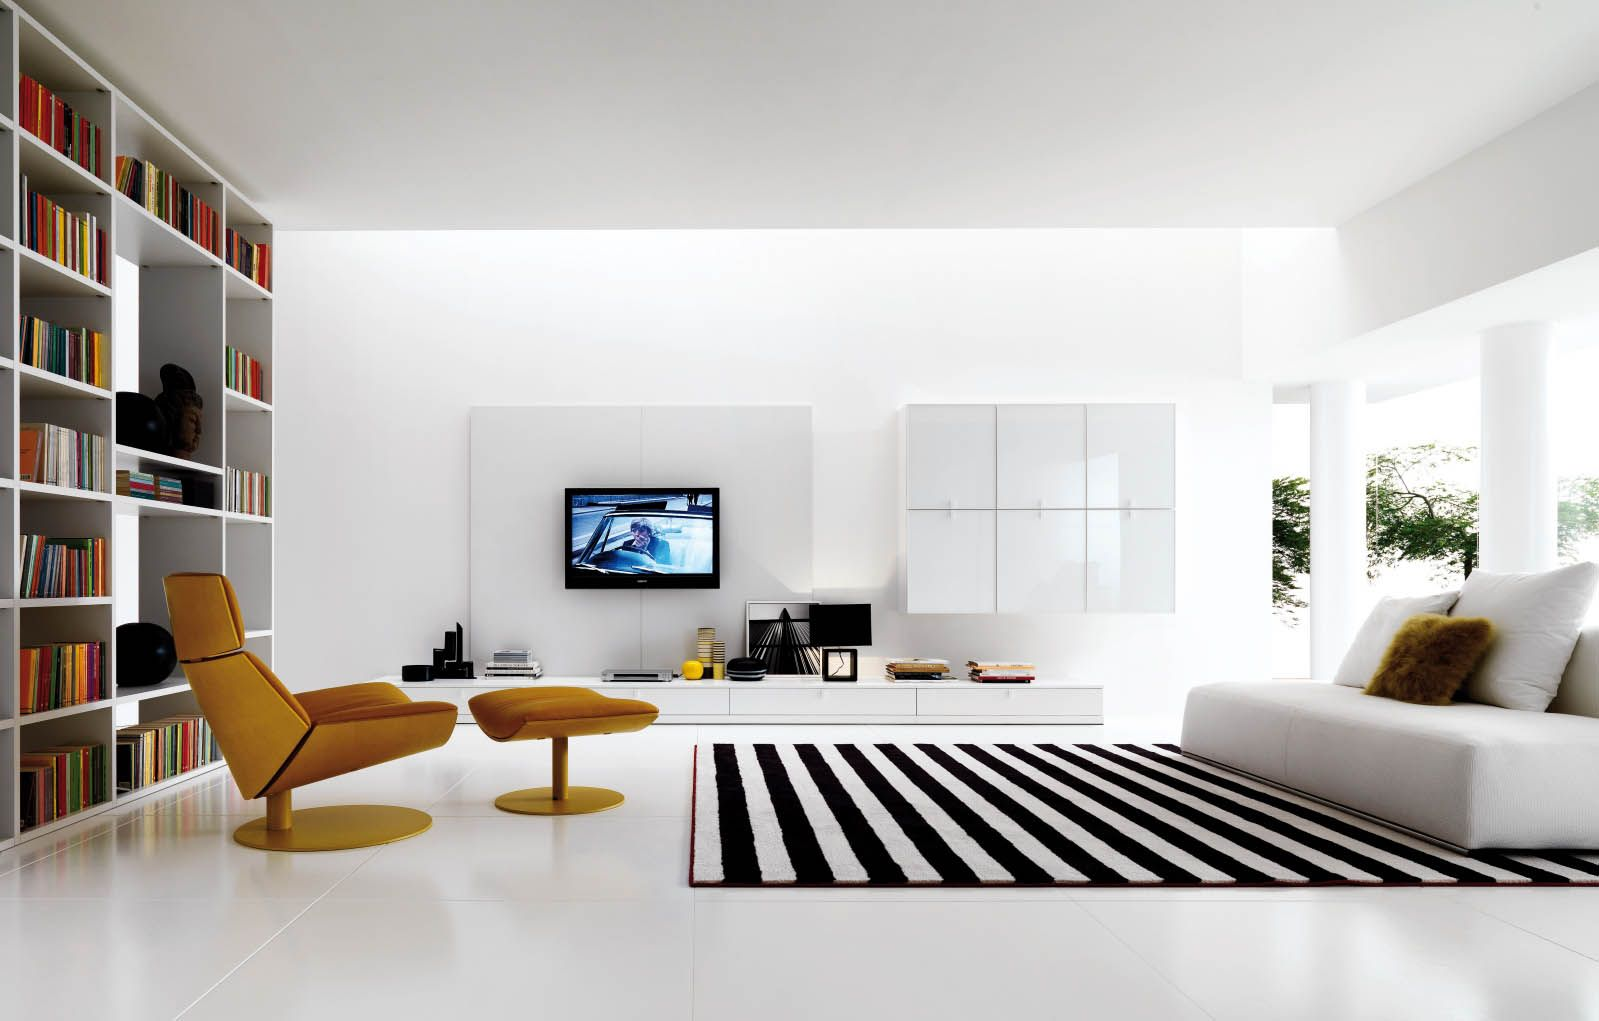 Best of 500 contemporary interiors - Contemporary Interiors Modern Design 1 On Home Architecture Design